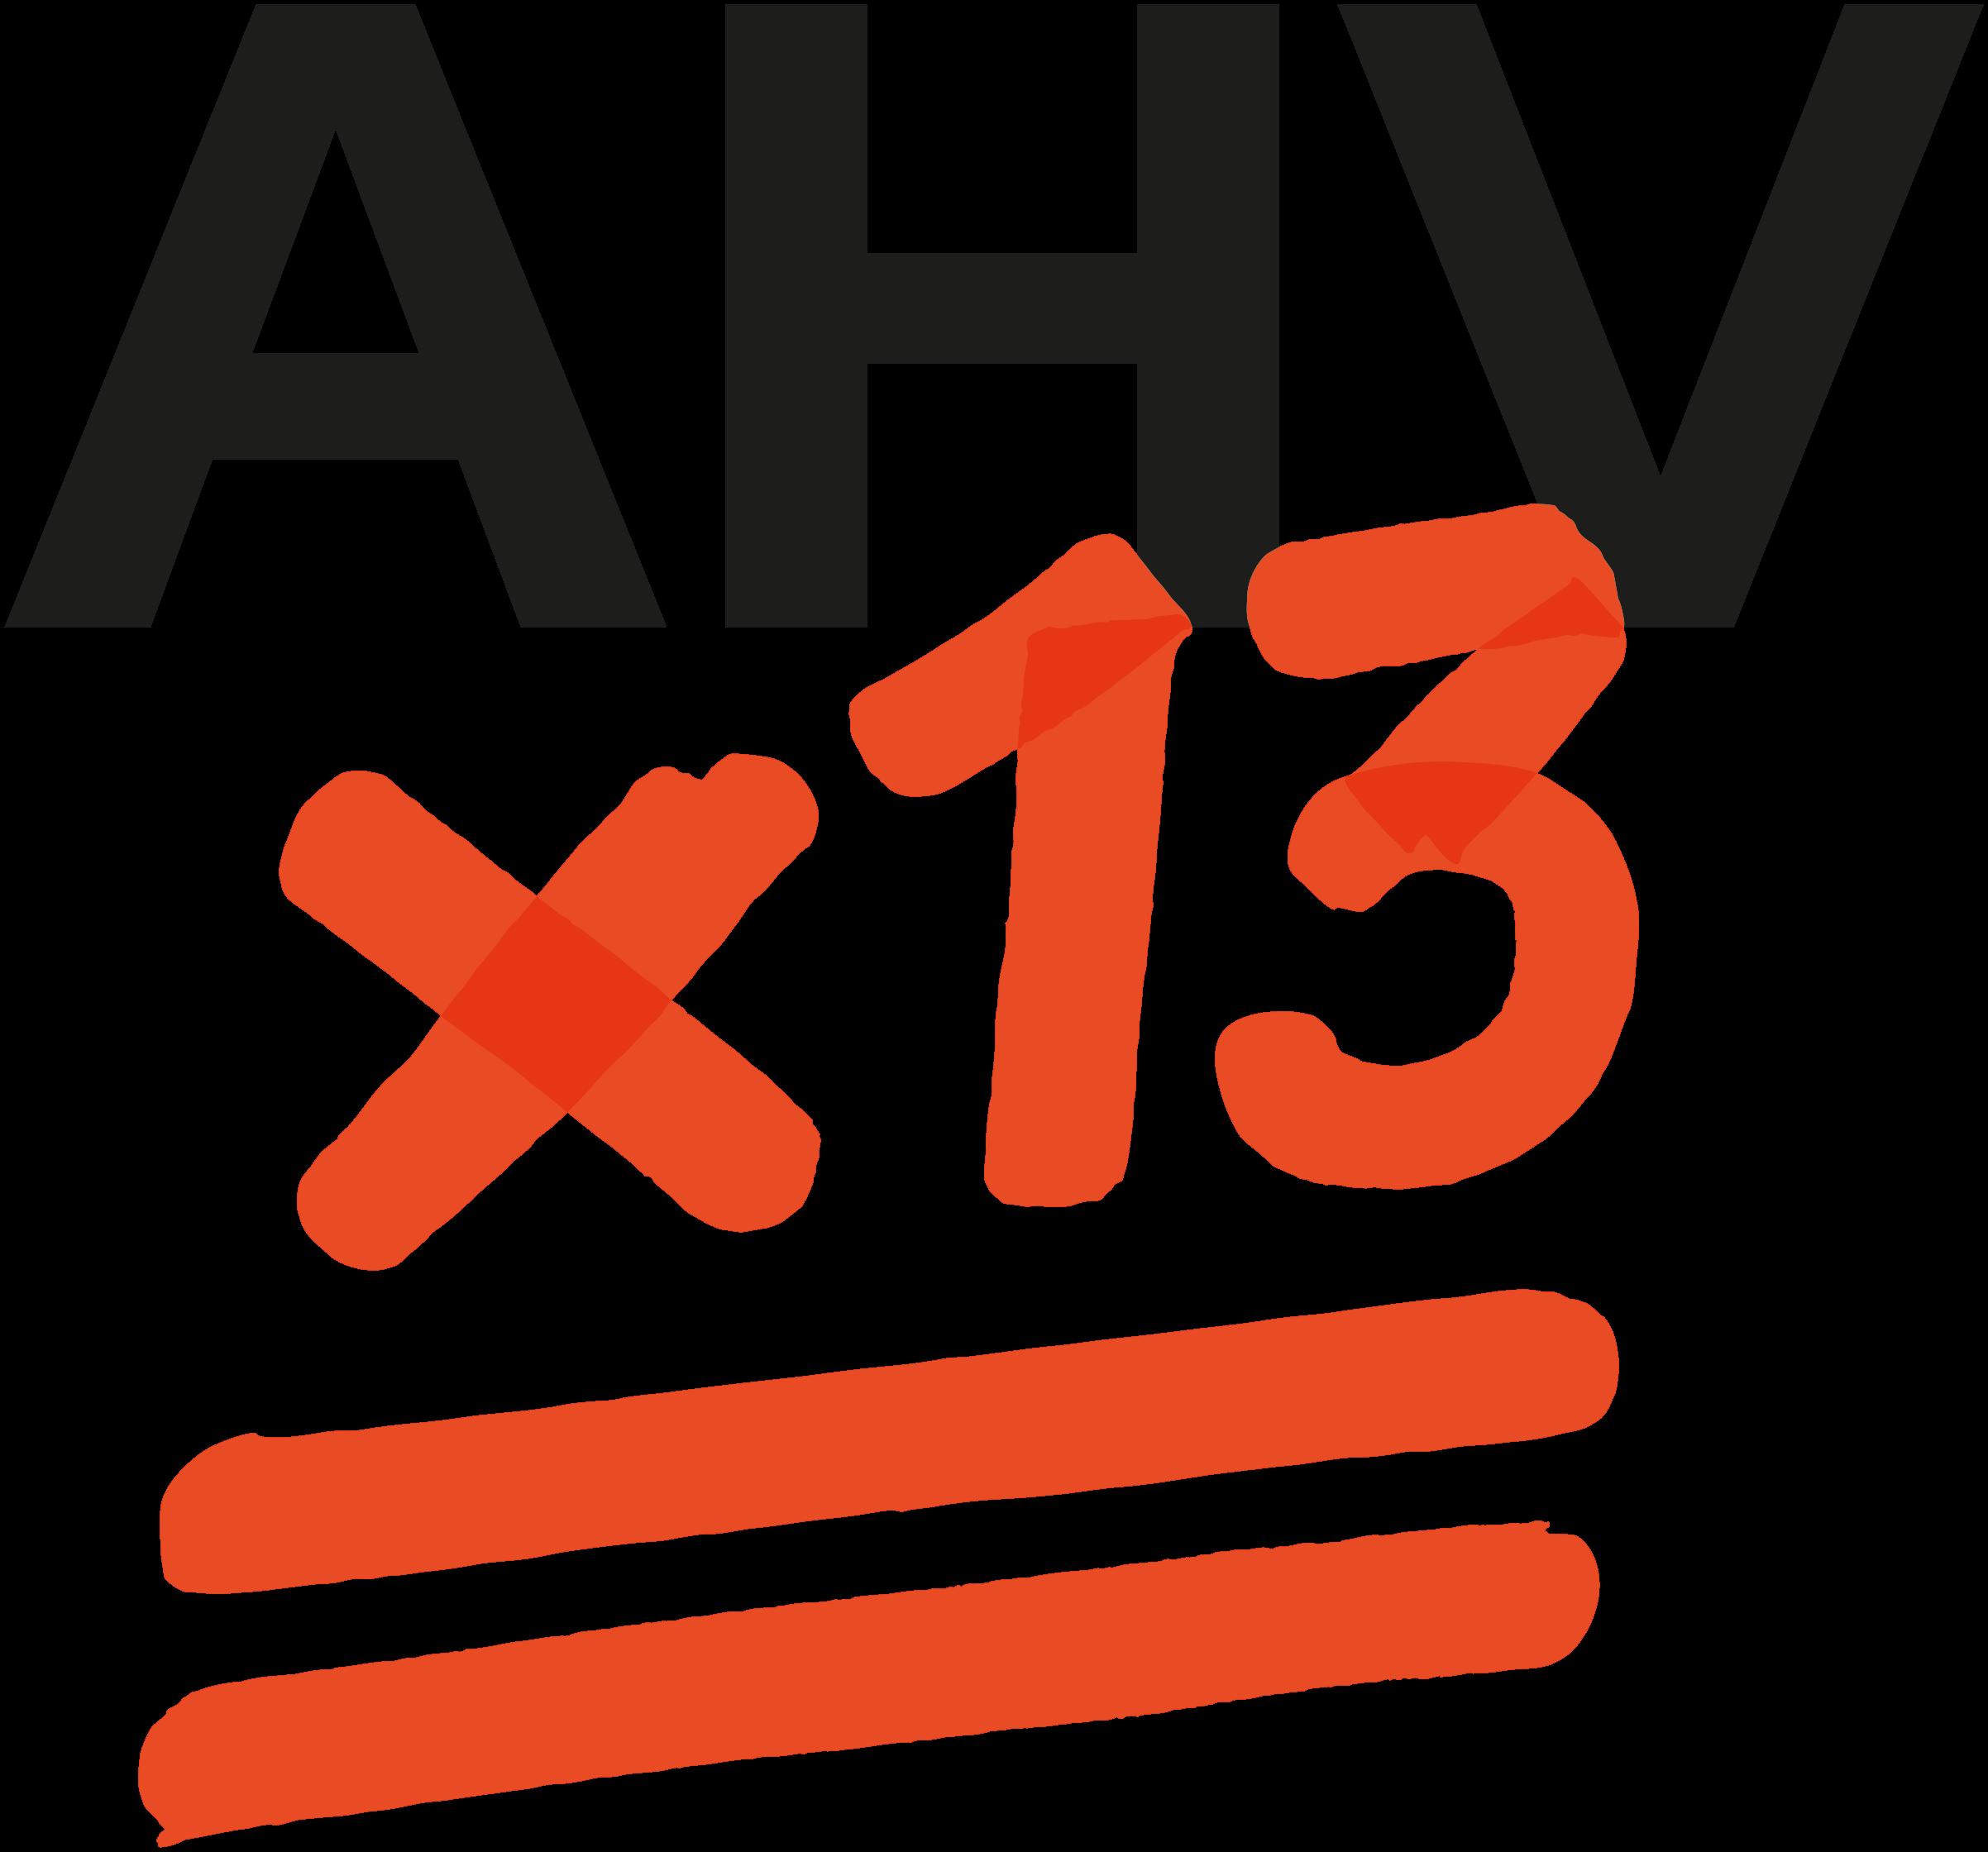 AHVx13